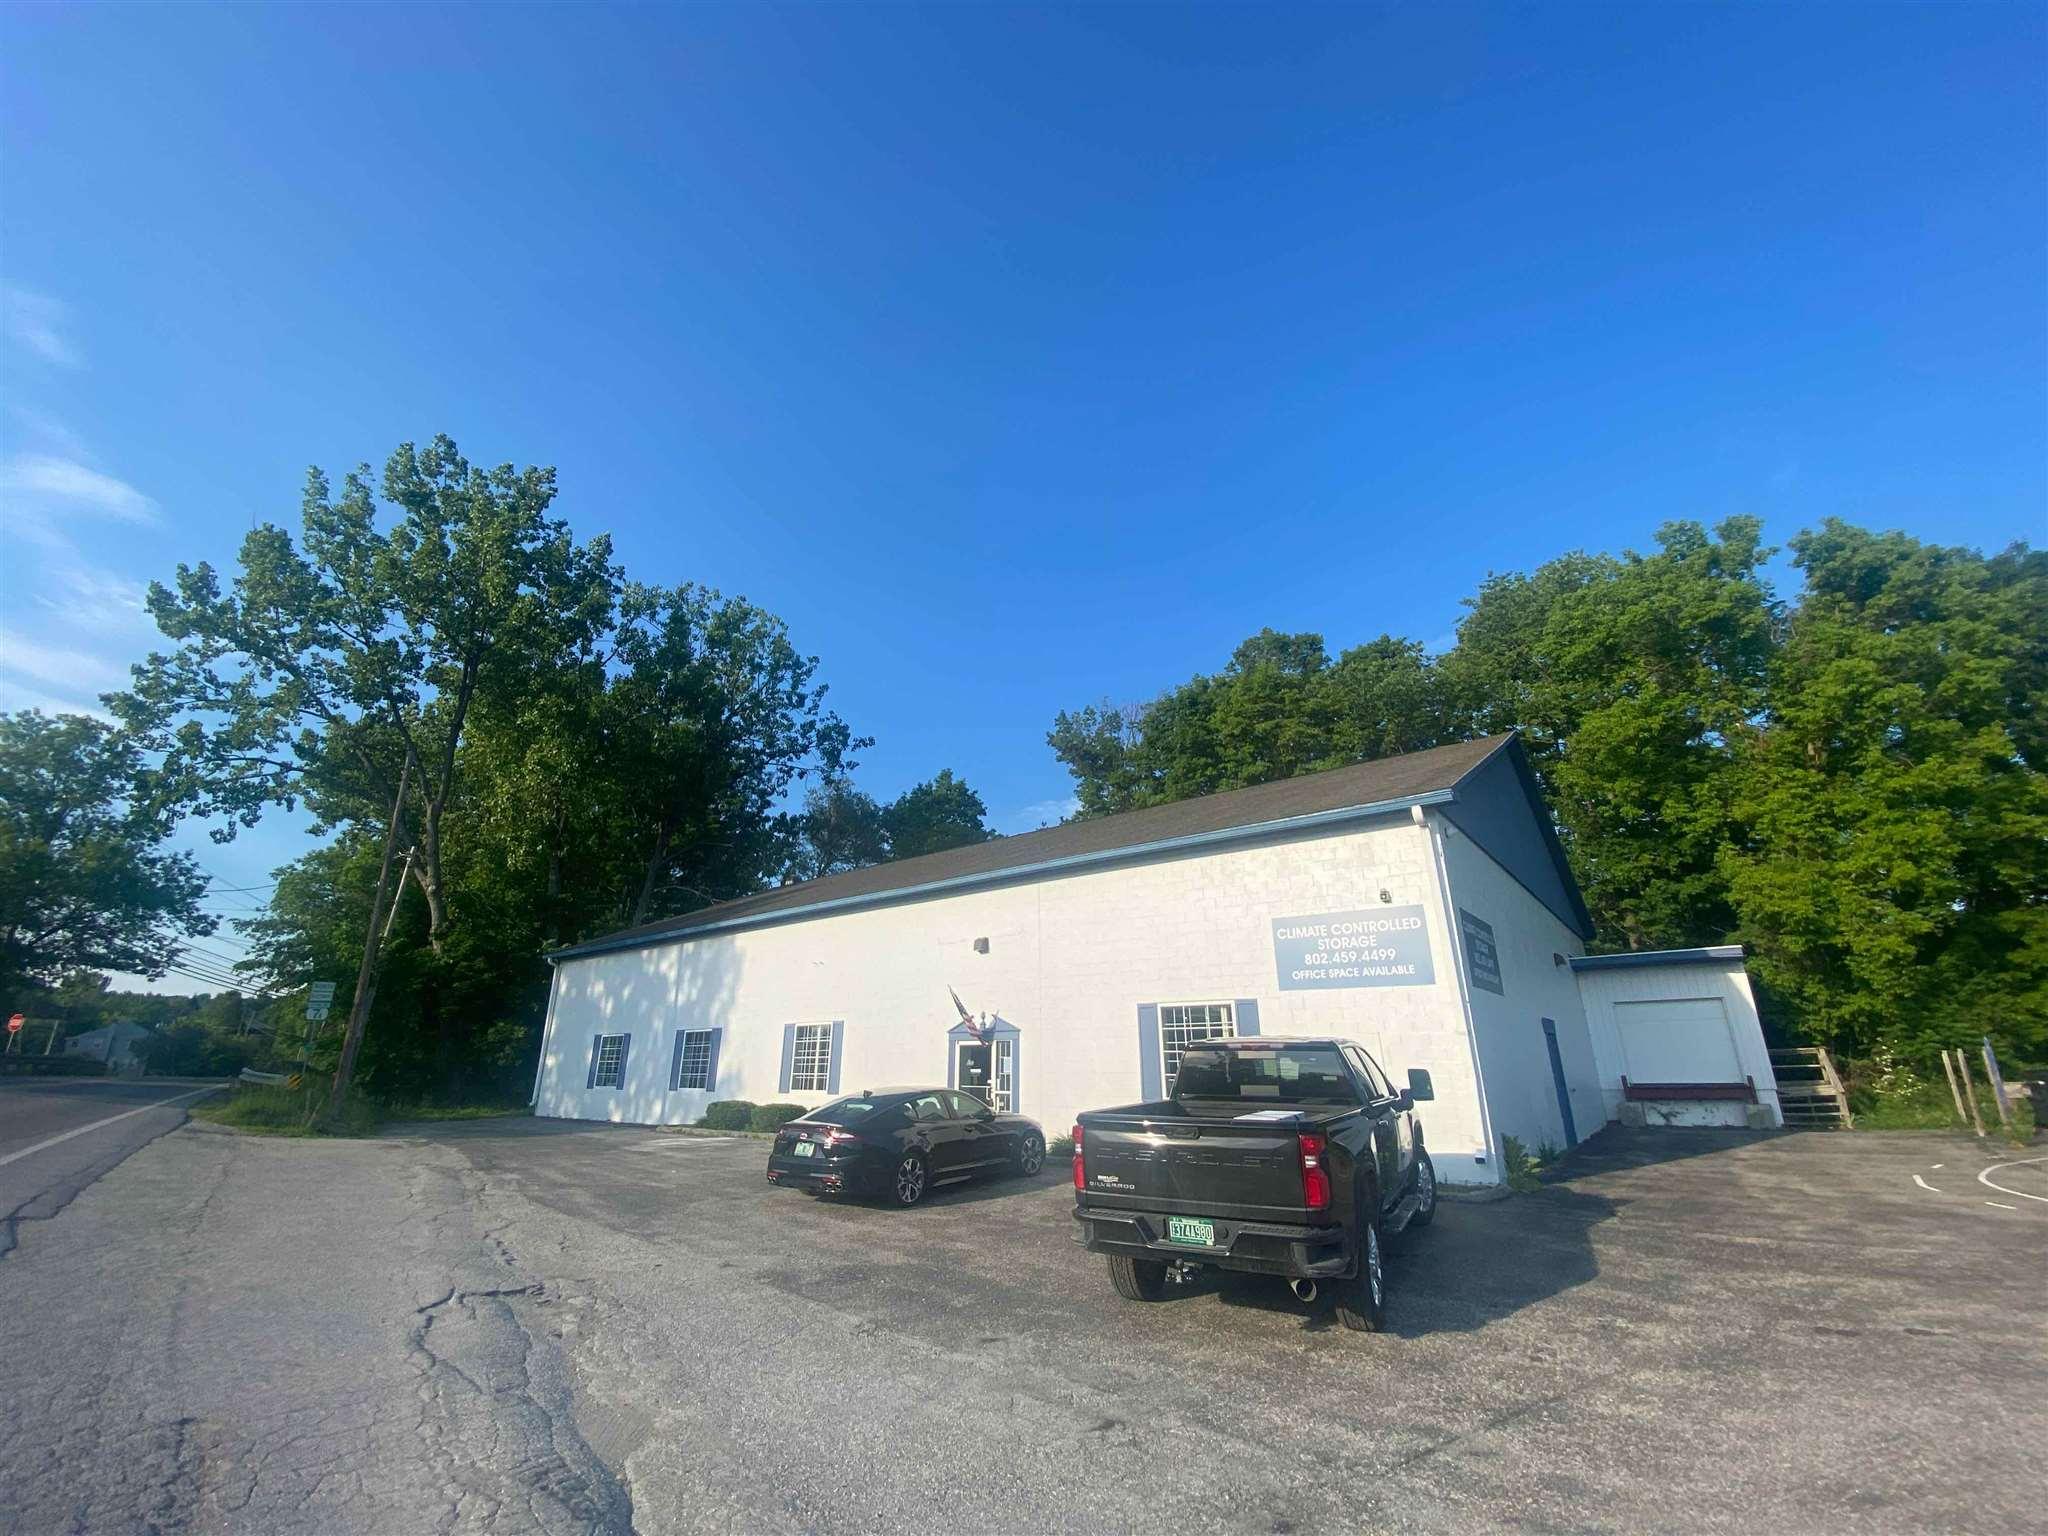 59 HARWOOD HILL Road, Bennington, VT 05201